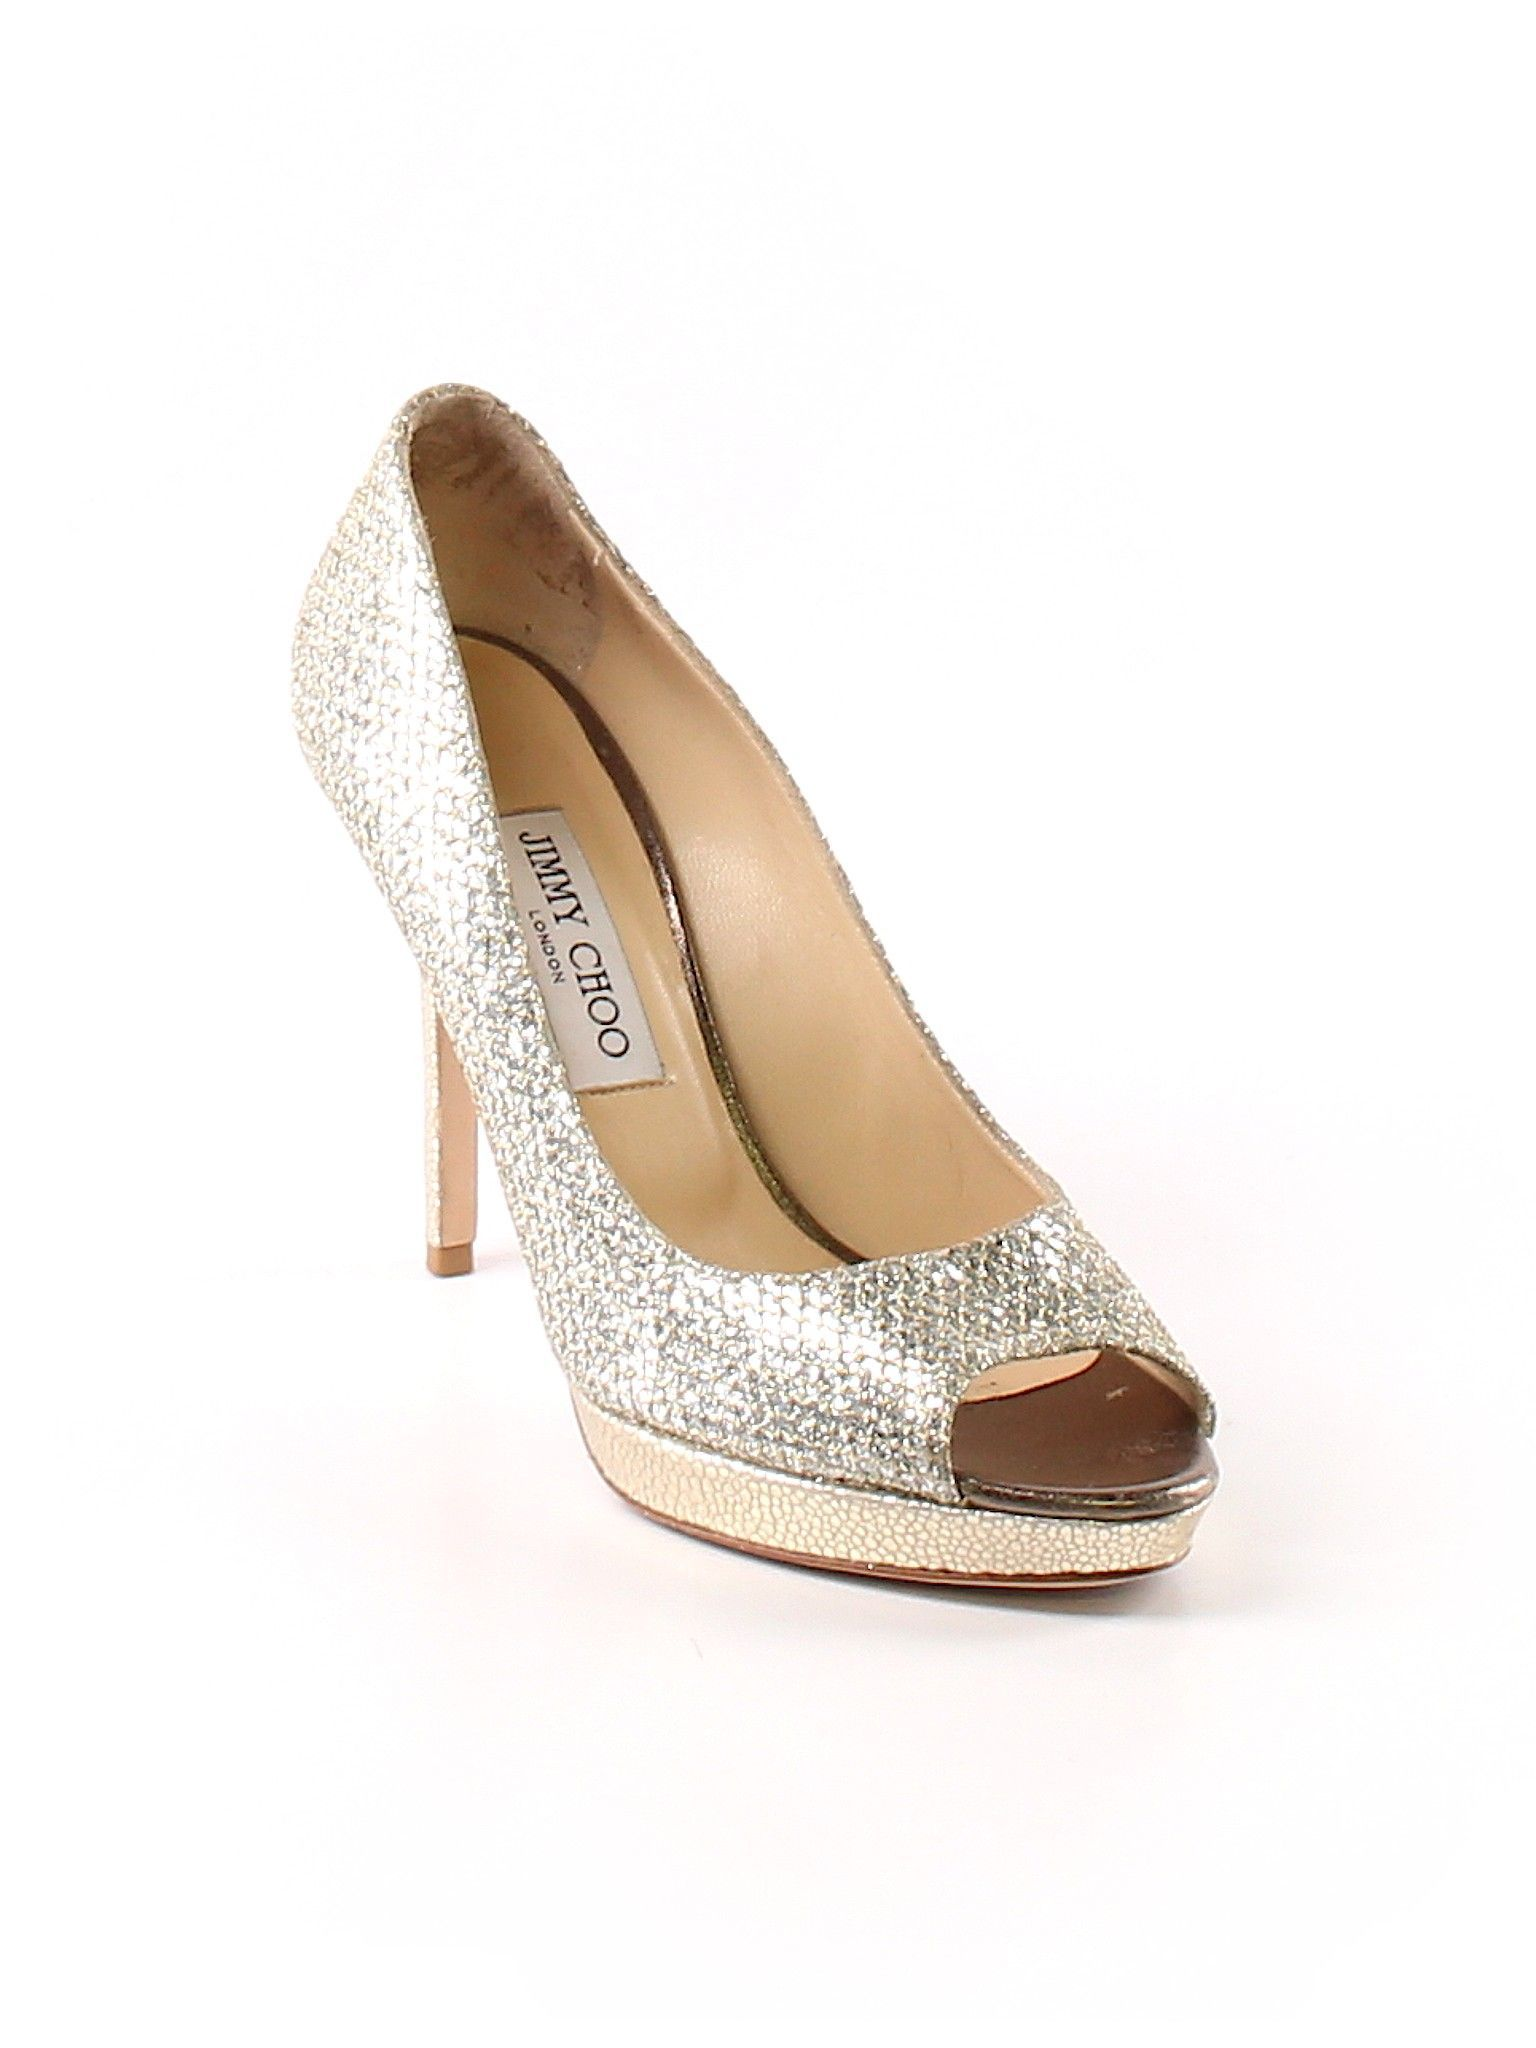 2288ba5ec2d Jimmy Choo Heels  Size 8 1 2 Gold Women s Clothing -  290.99